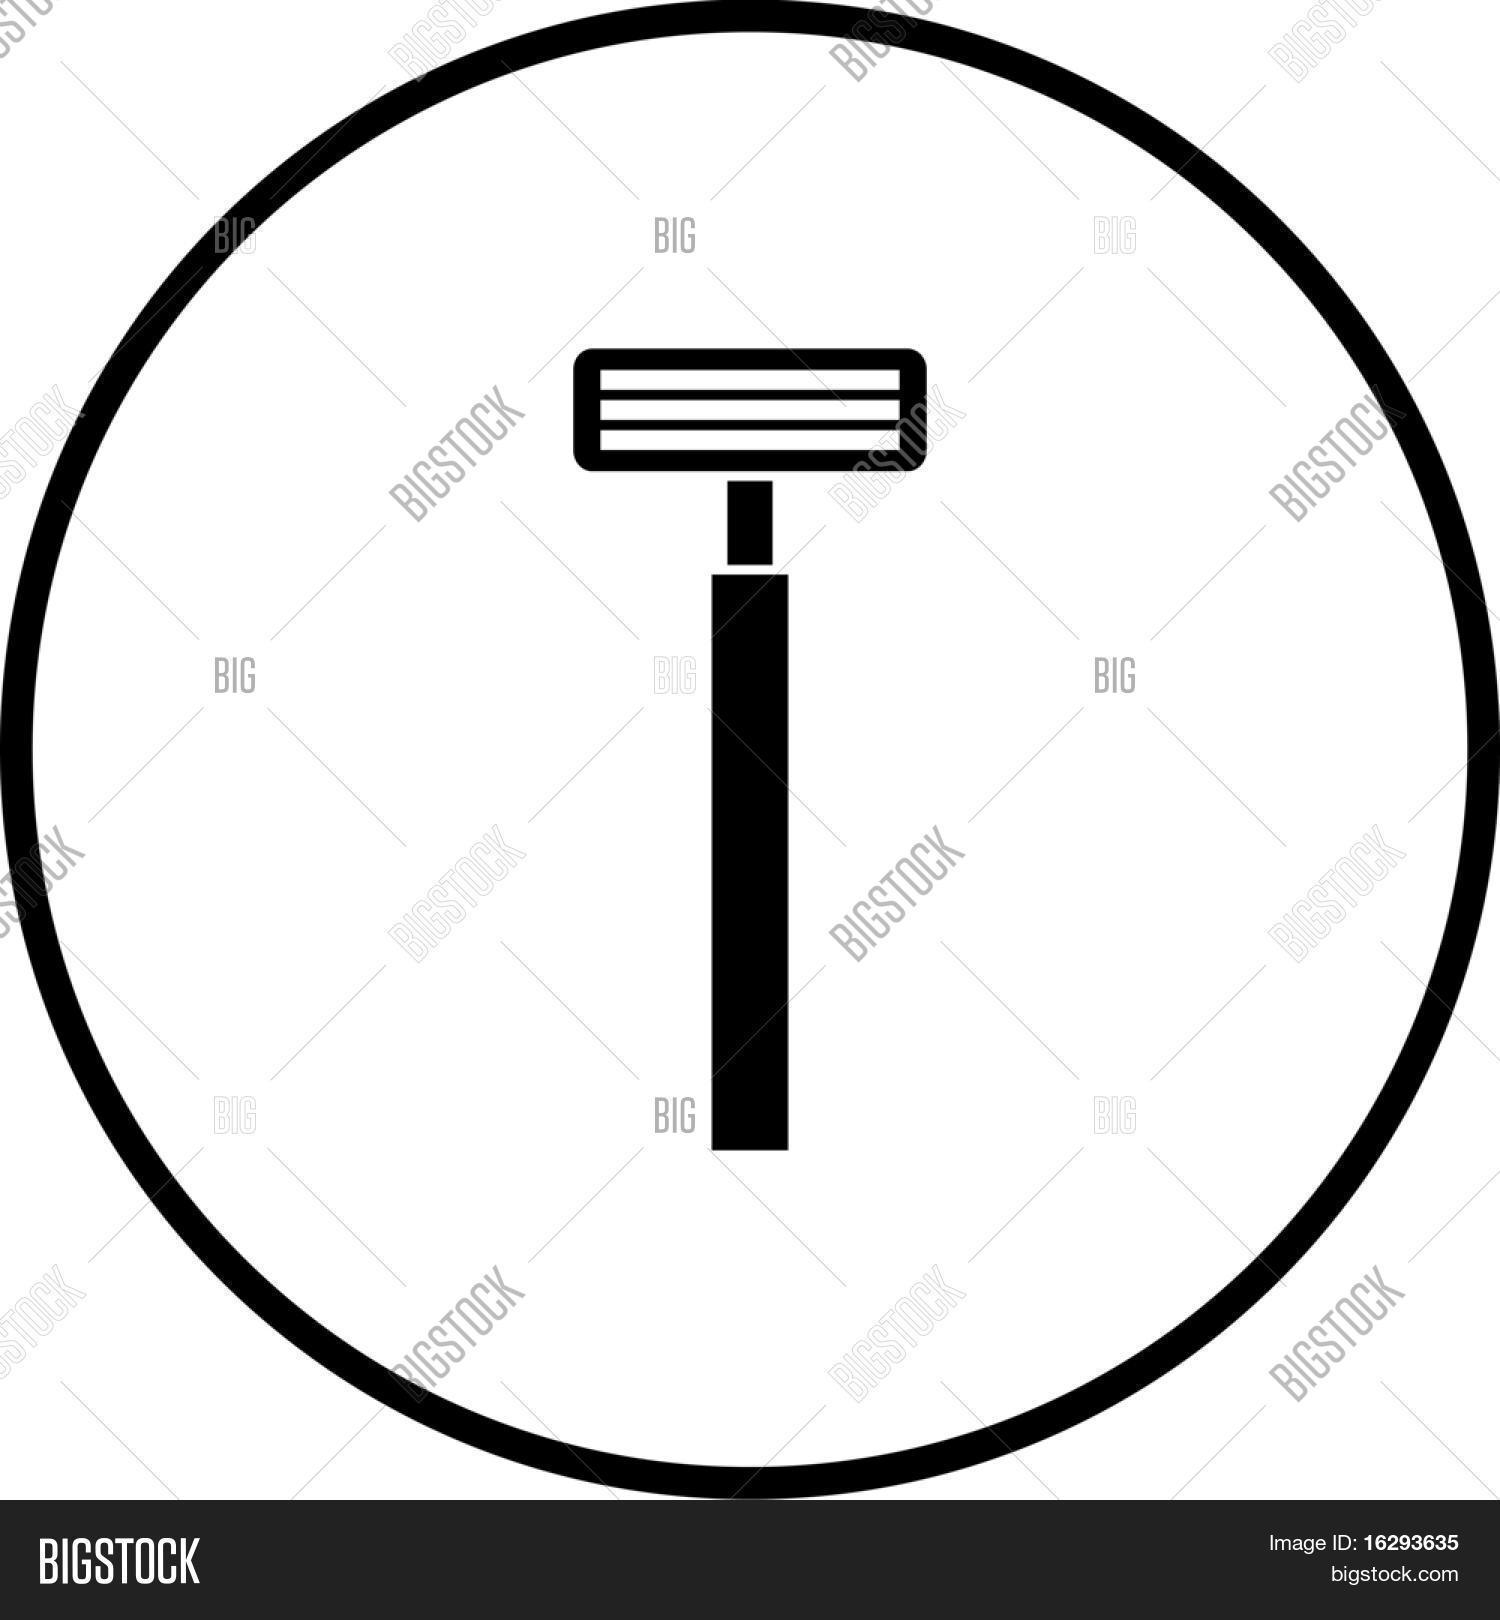 Shaving Razor Symbol Image & Photo (Free Trial) | Bigstock